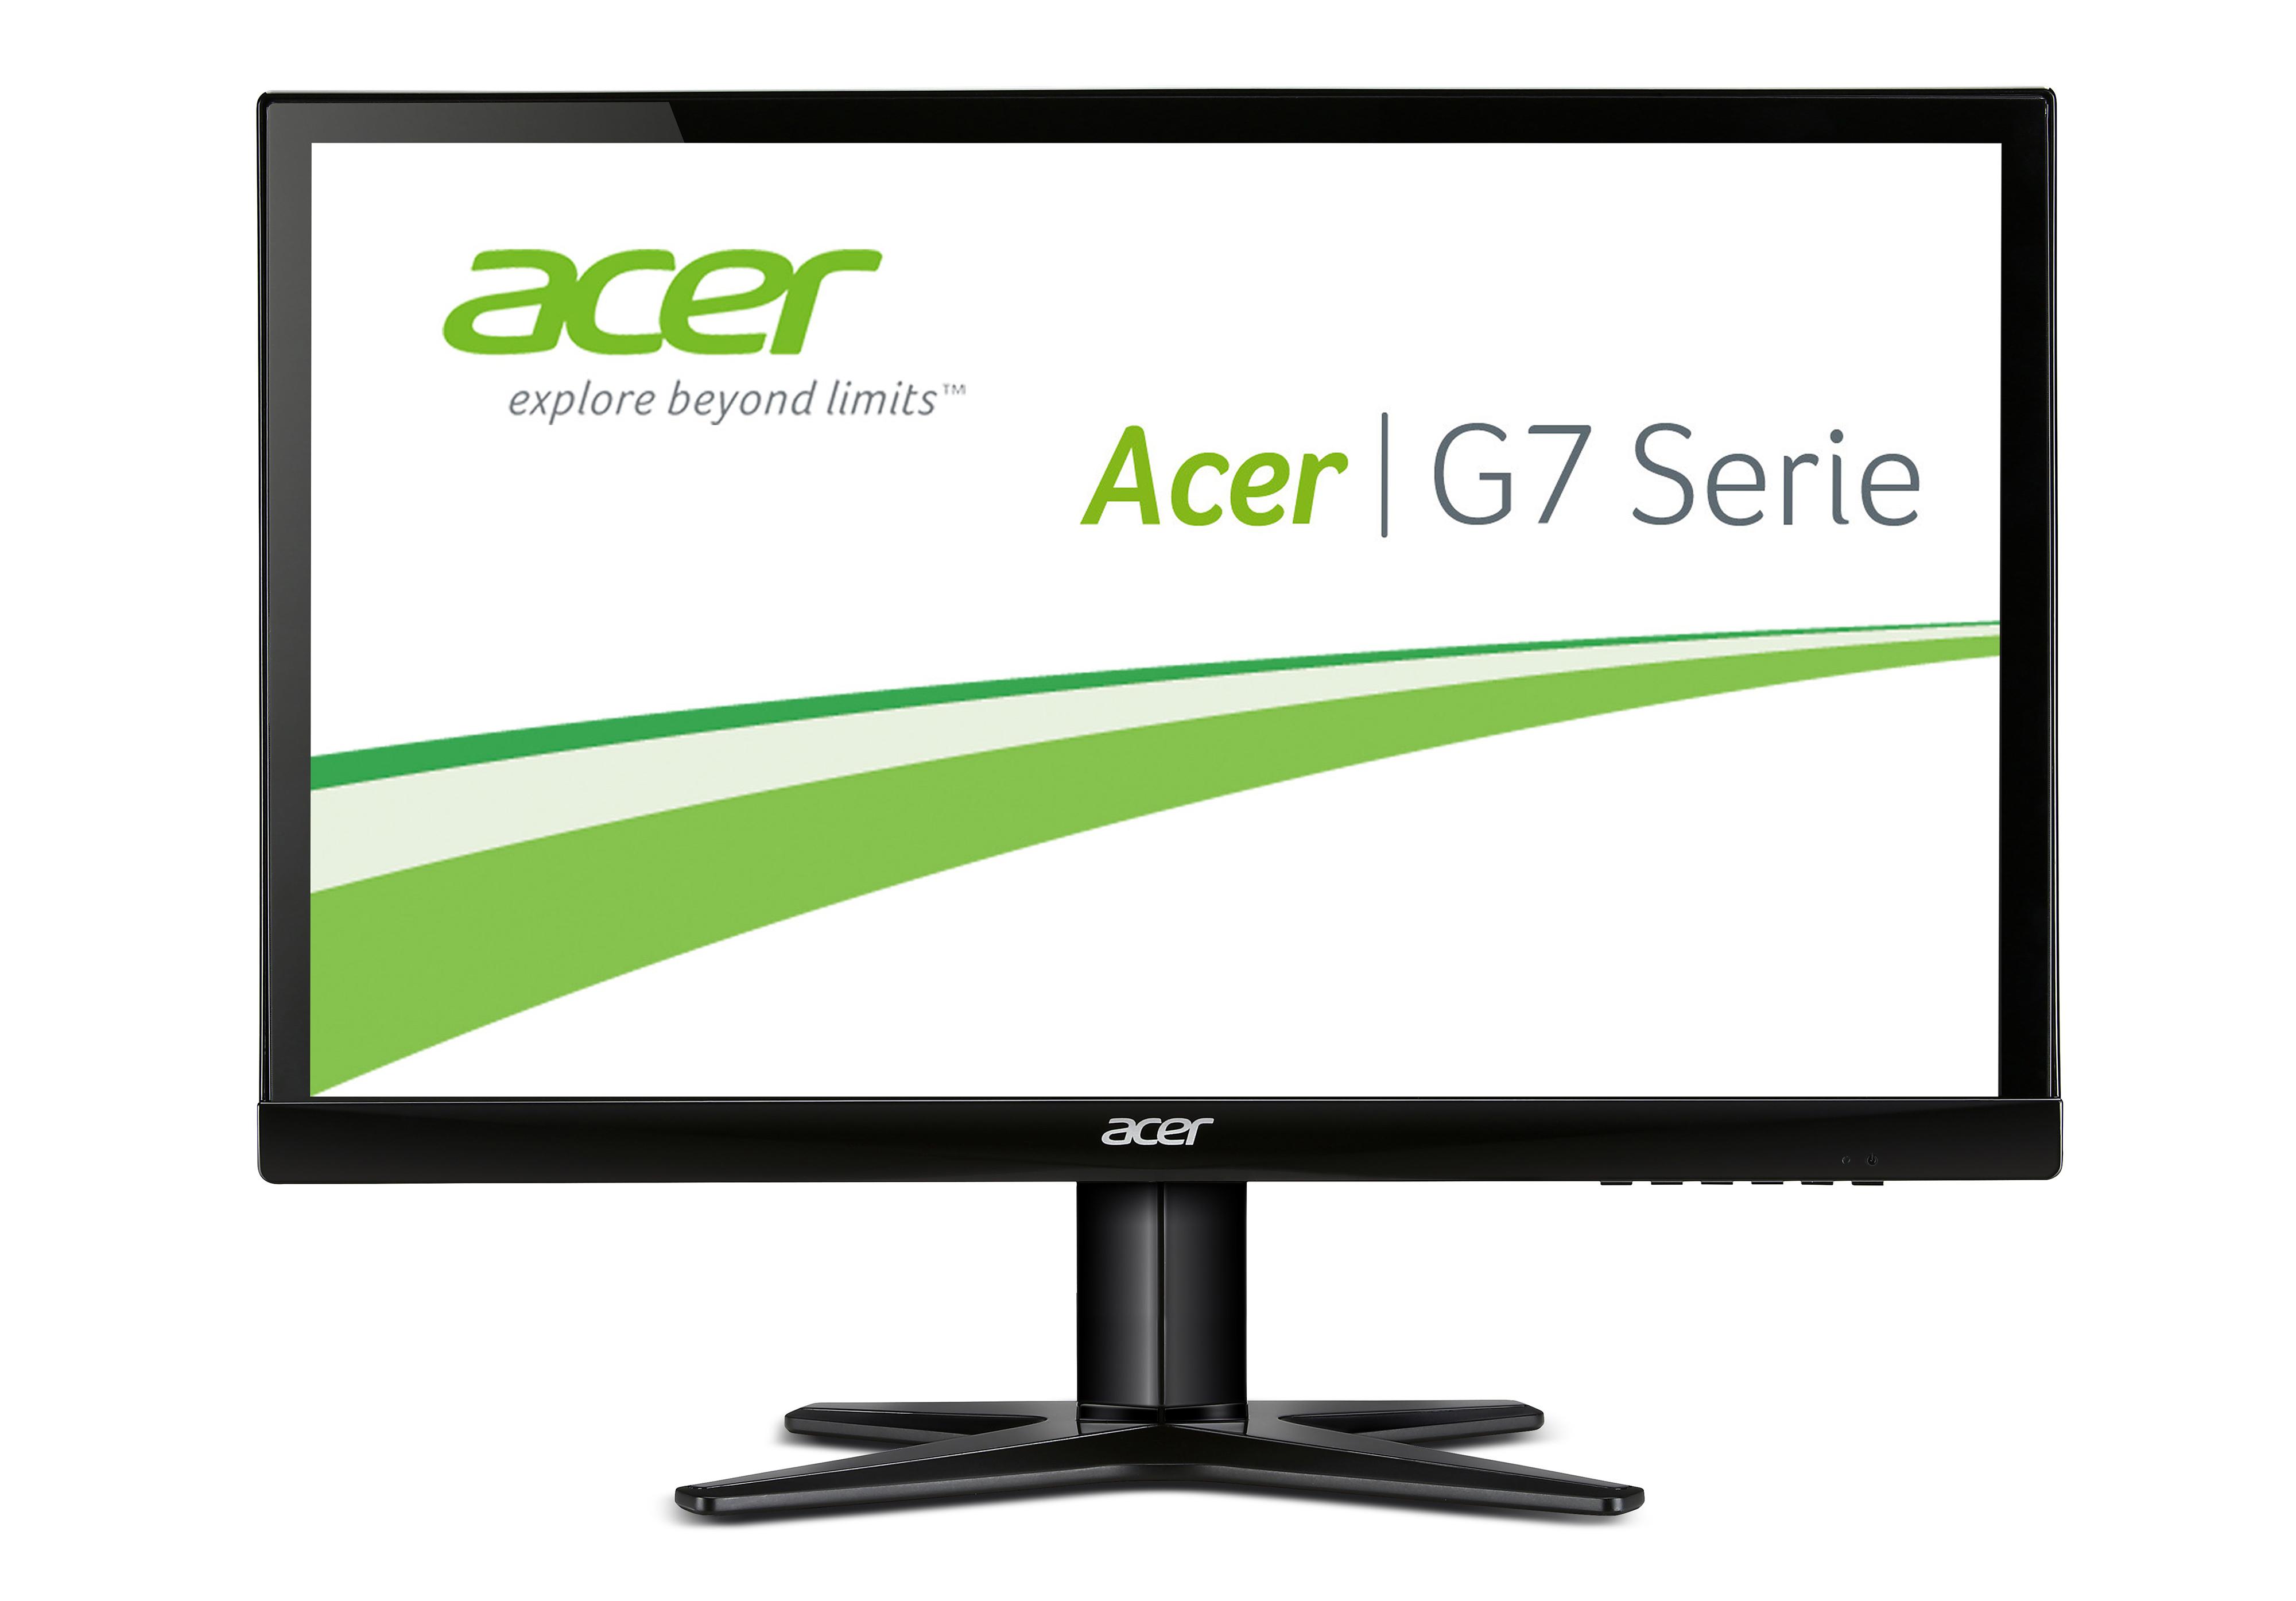 "Acer LCD G227HQLAbid, 55cm (22"") IPS LED, 1920 x 1080, 100M:1, 250cd/m2, 178°/ 178°, 6ms, VGA, DVI, HDMI, Black,"